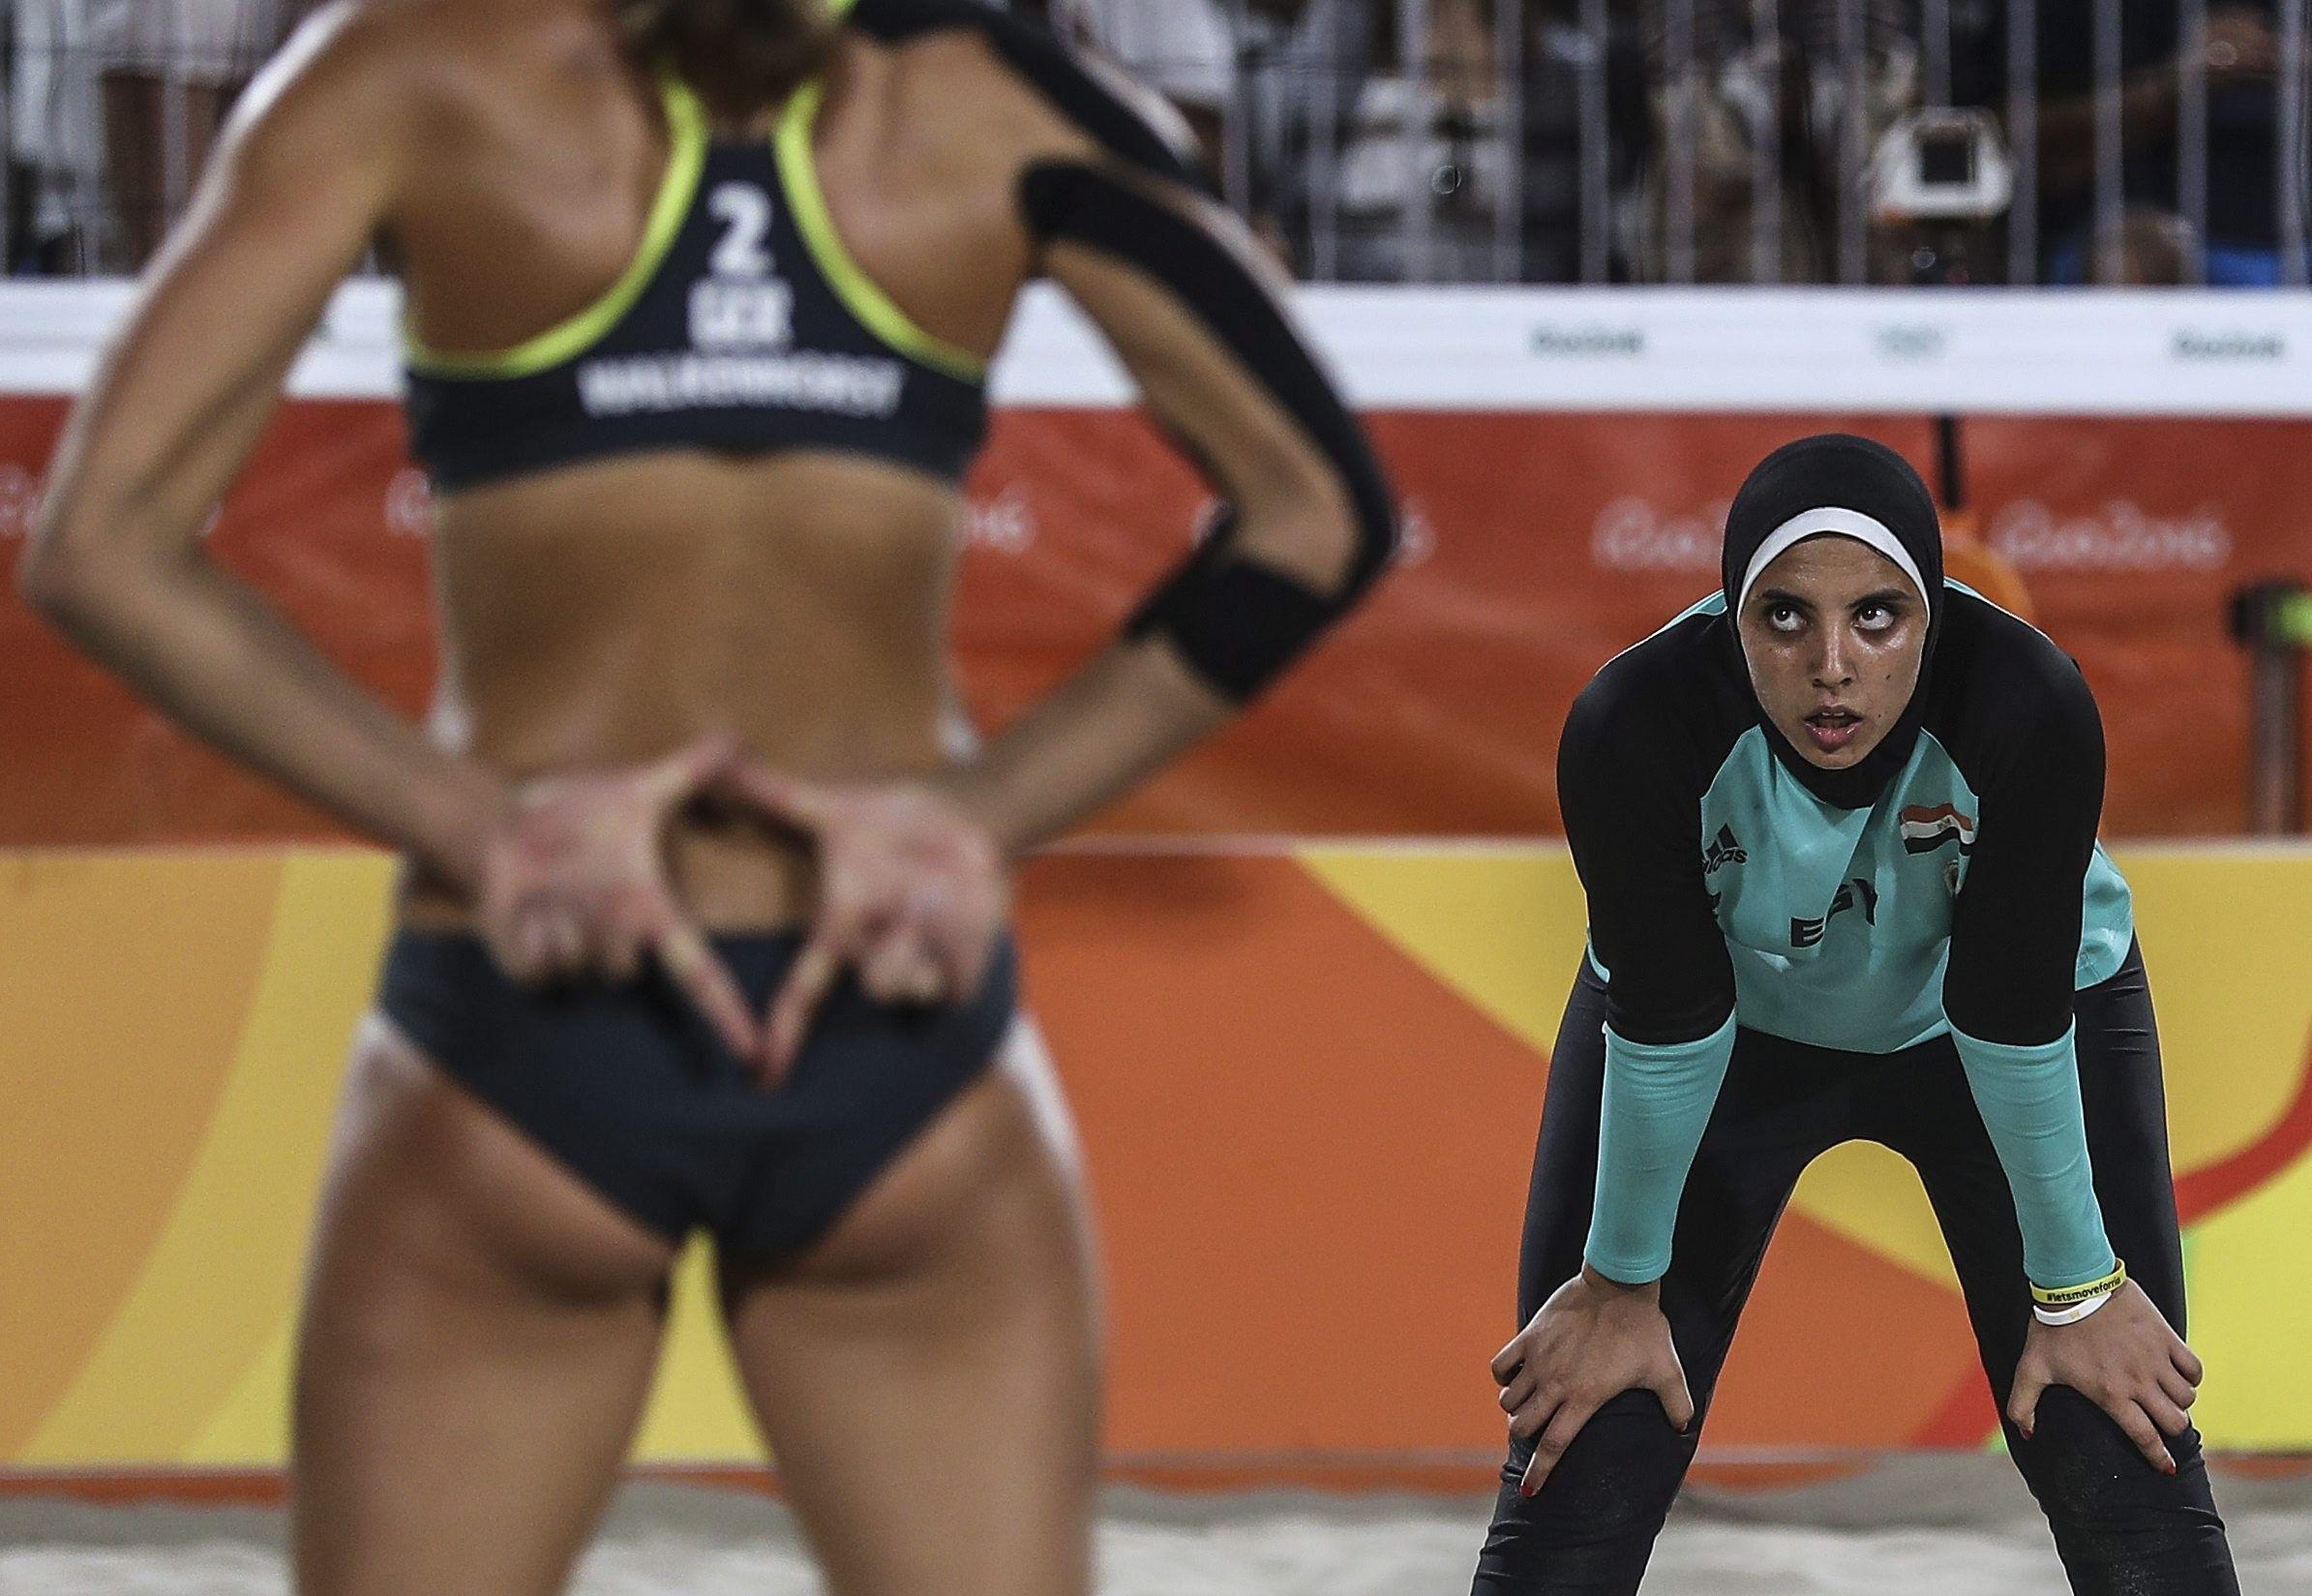 Rio 2016 8211 Beach Volleyball Volleyball Kleidung Beach Volleyball The Bikini